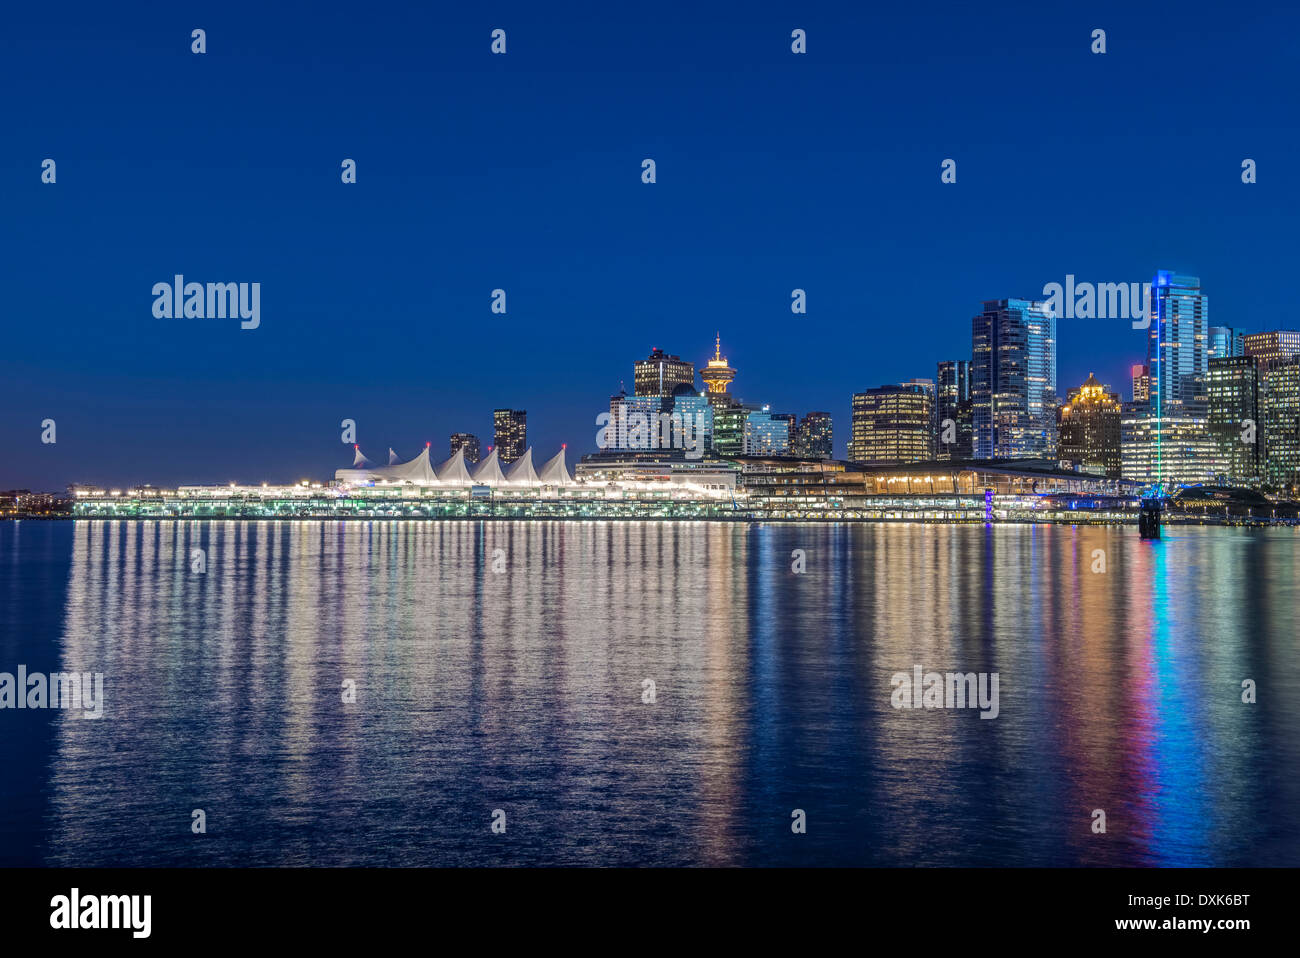 Waterfront Skyline beleuchtet in der Nacht, Vancouver, Britisch-Kolumbien, Kanada, Stockbild